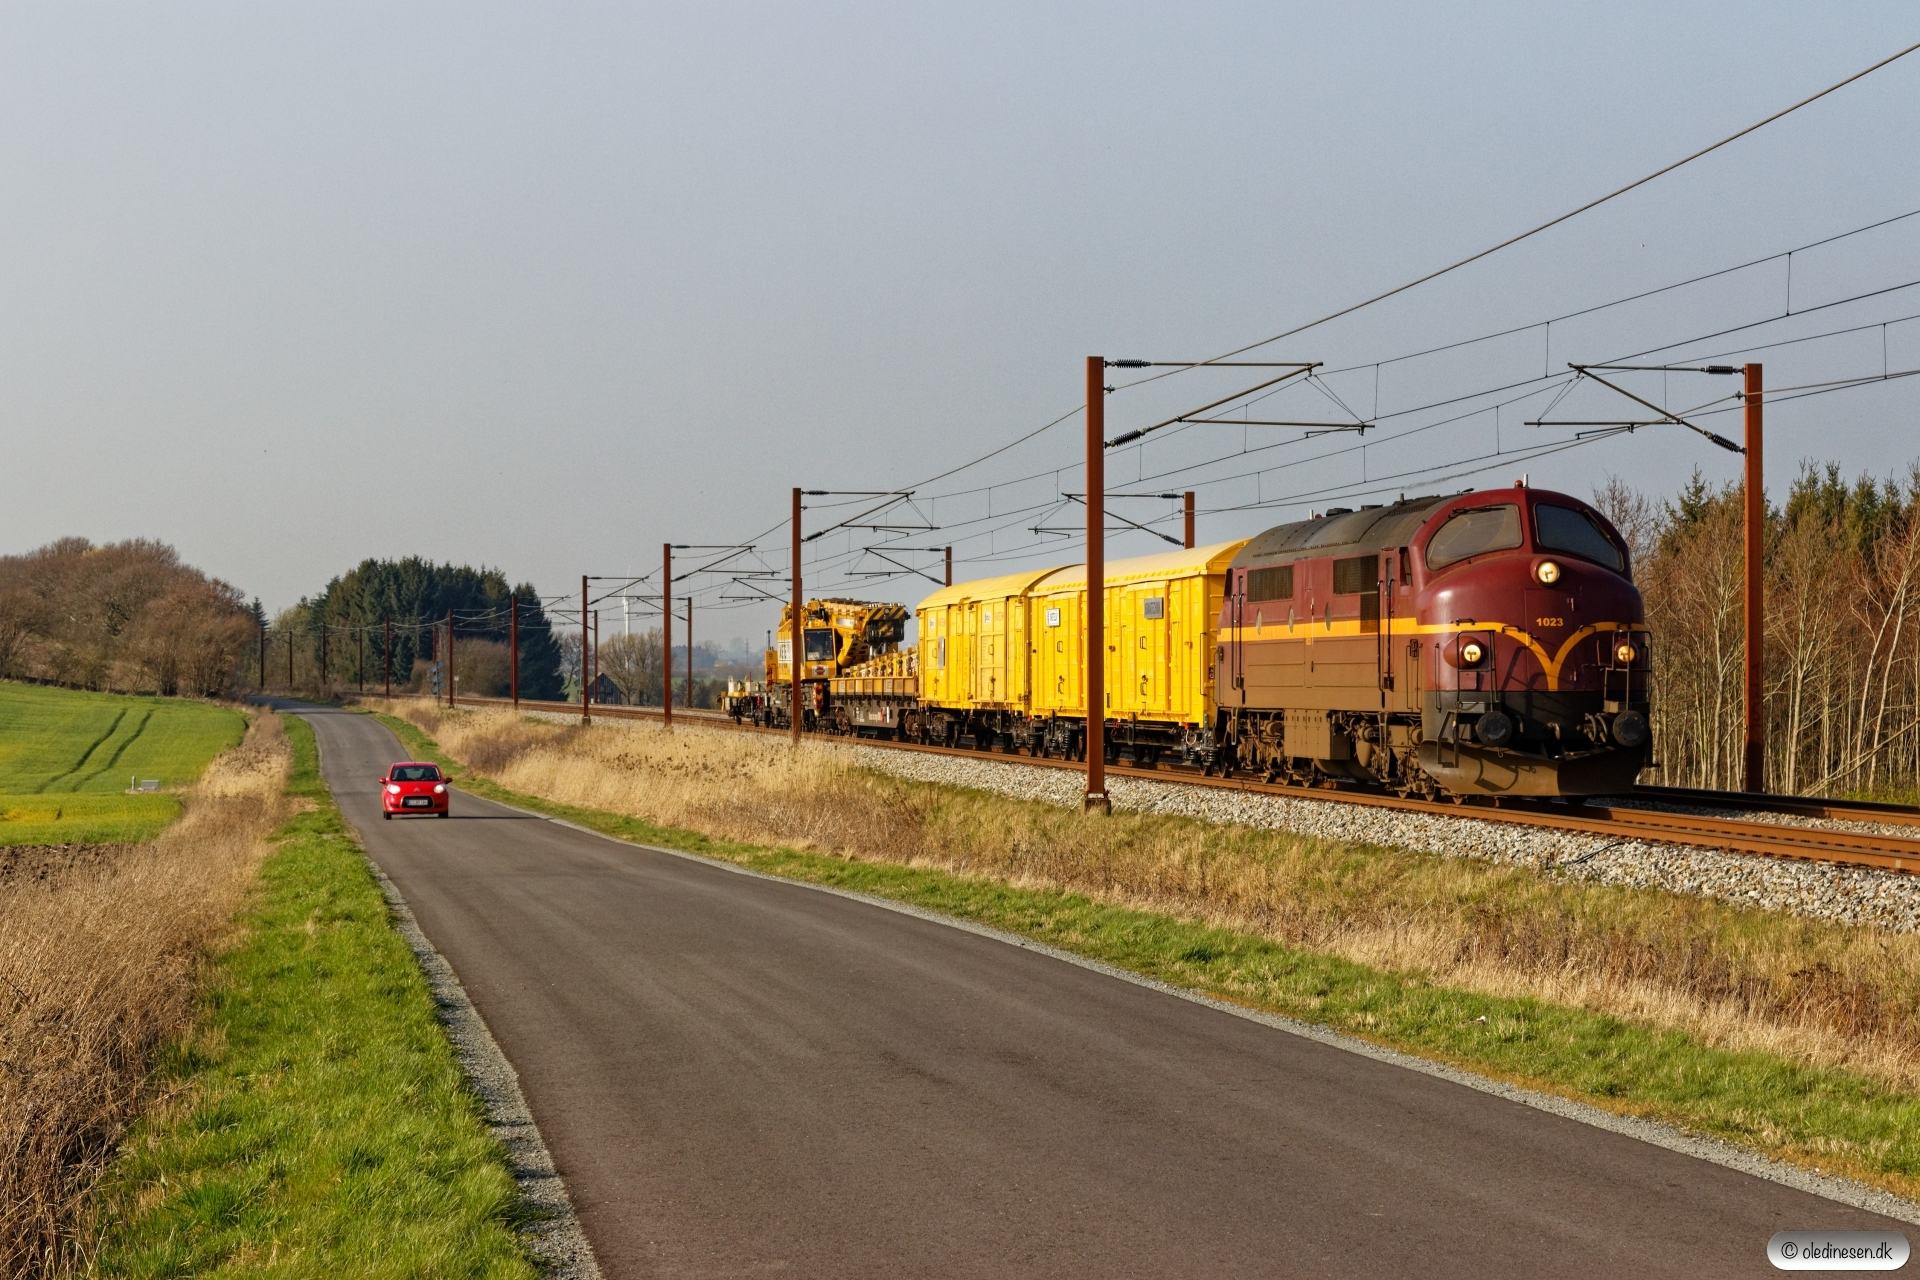 CFLCD MX 1023 med BG 6080 Pa-Rg. Km 195,4 Kh (Ejby-Nørre Åby) 30.03.2019.